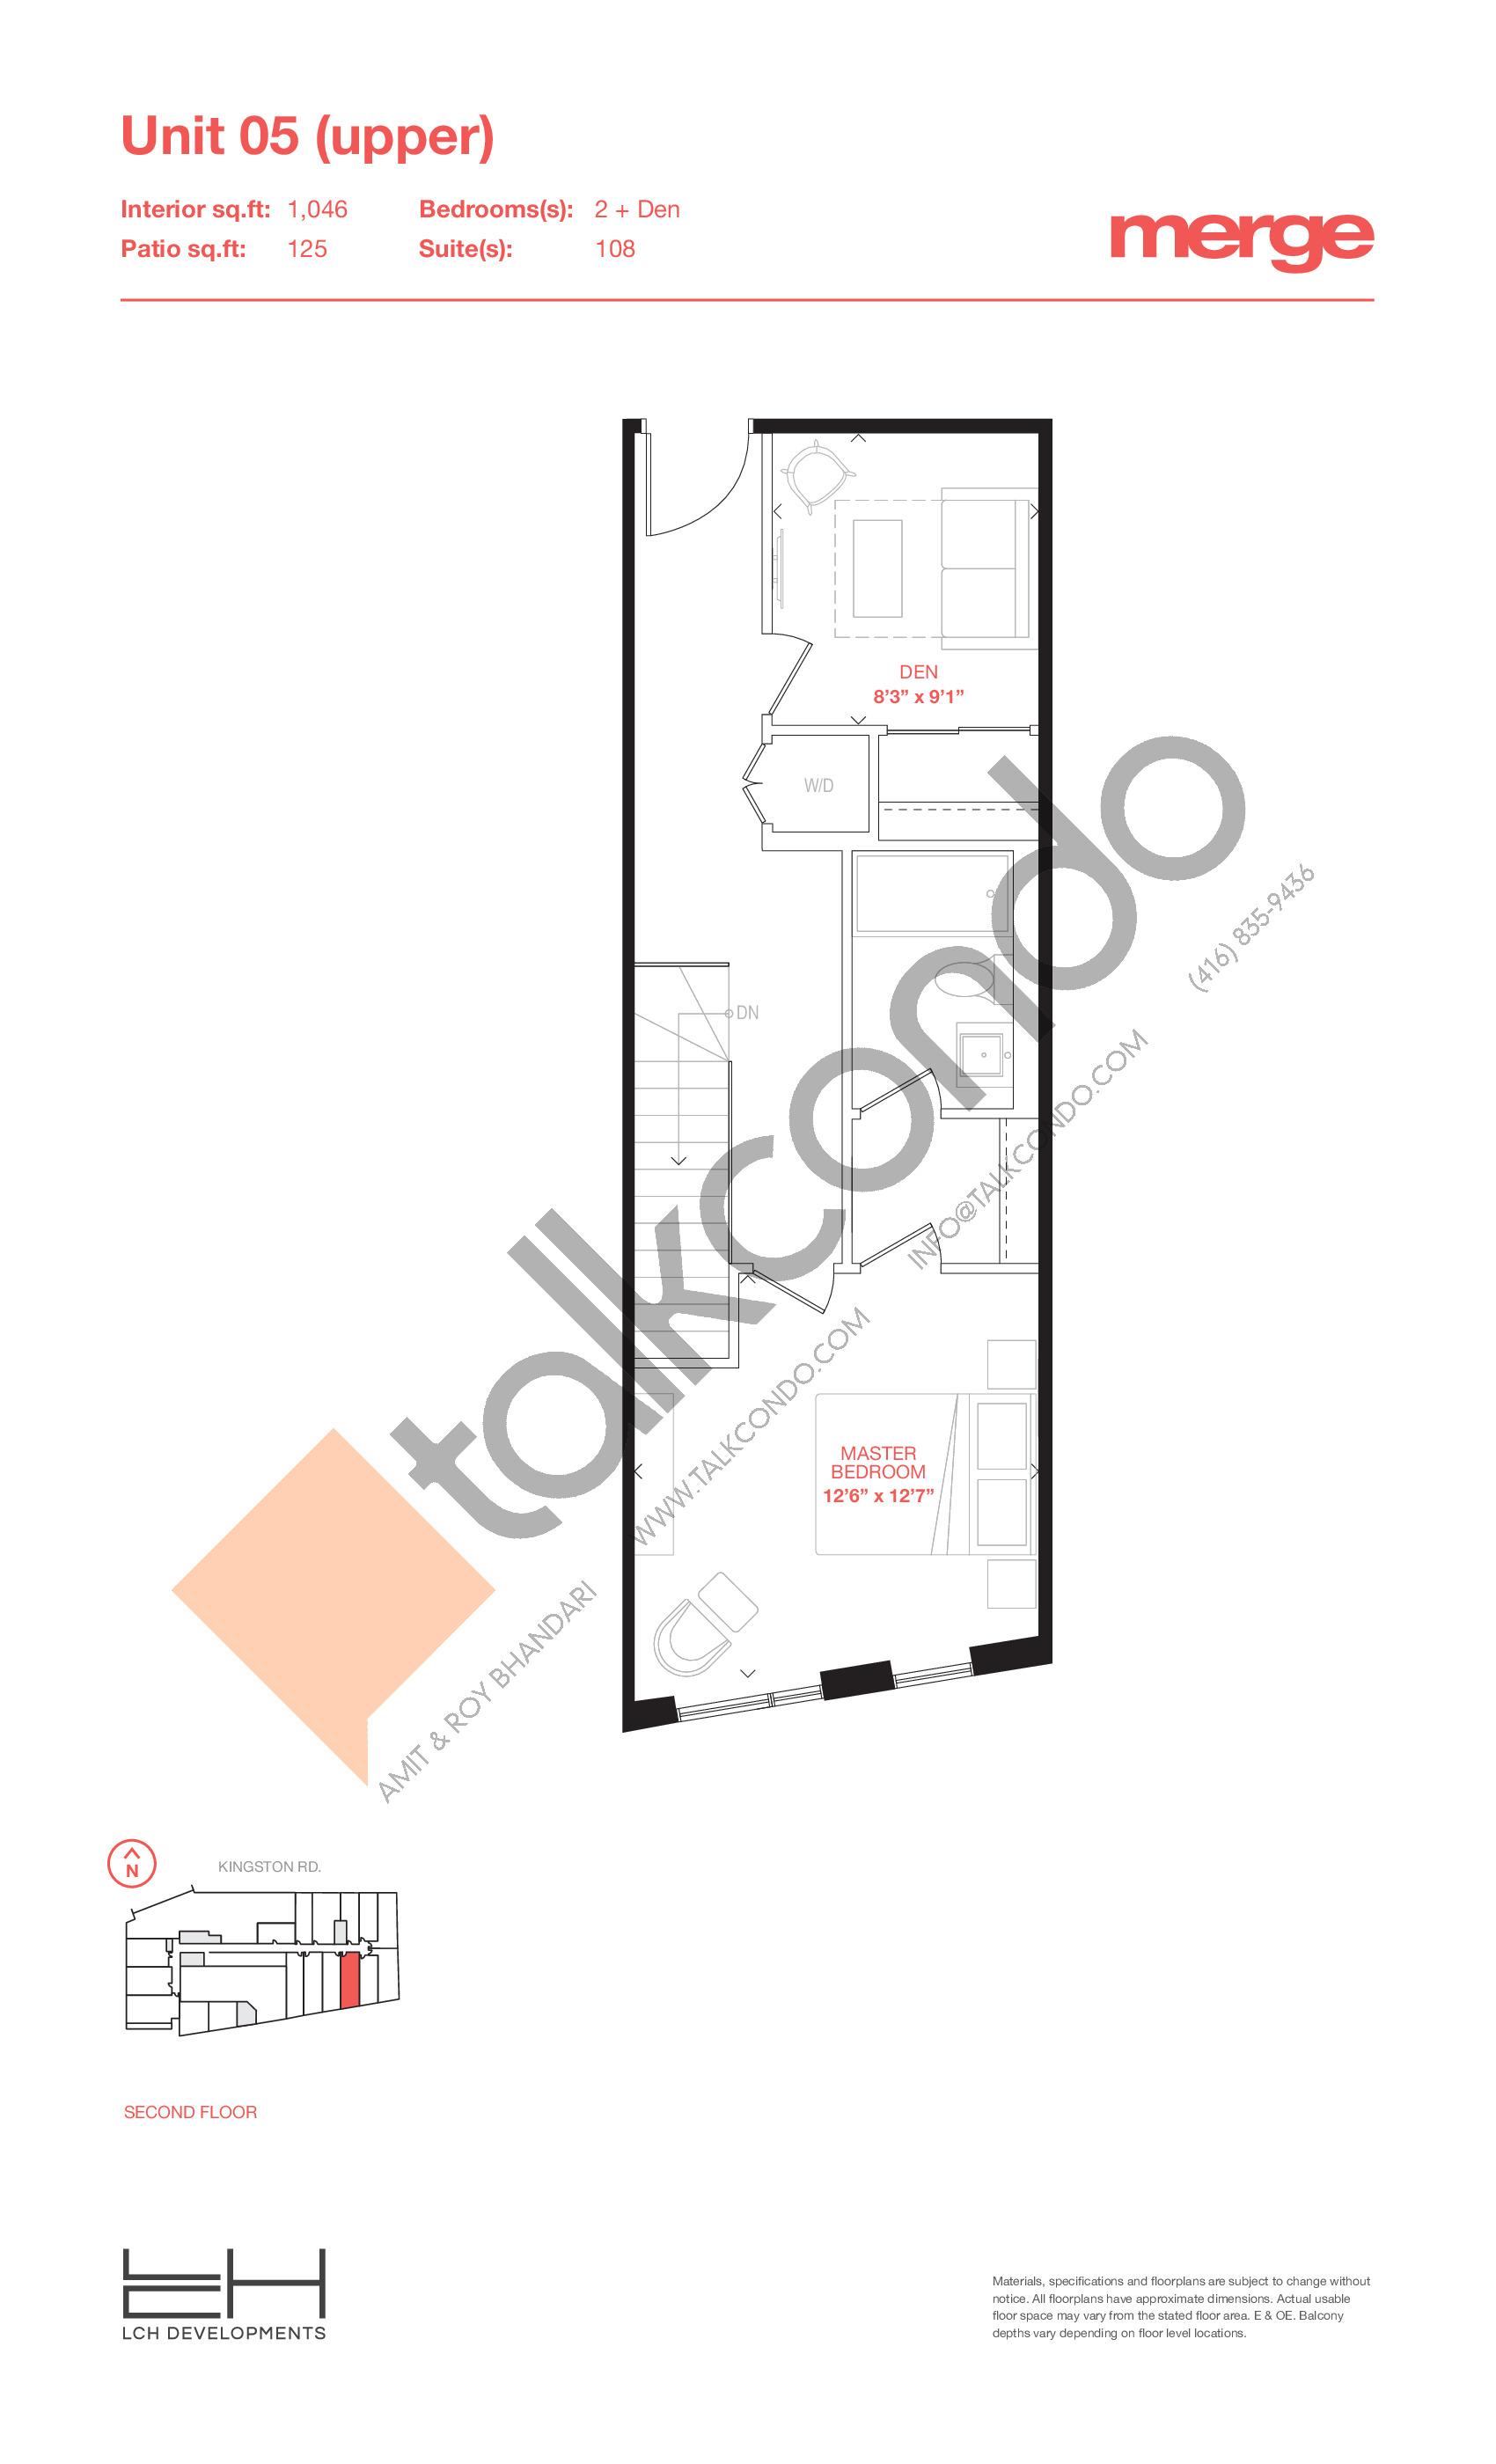 Unit 05 (Upper) - Townhouse Floor Plan at Merge Condos - 1046 sq.ft